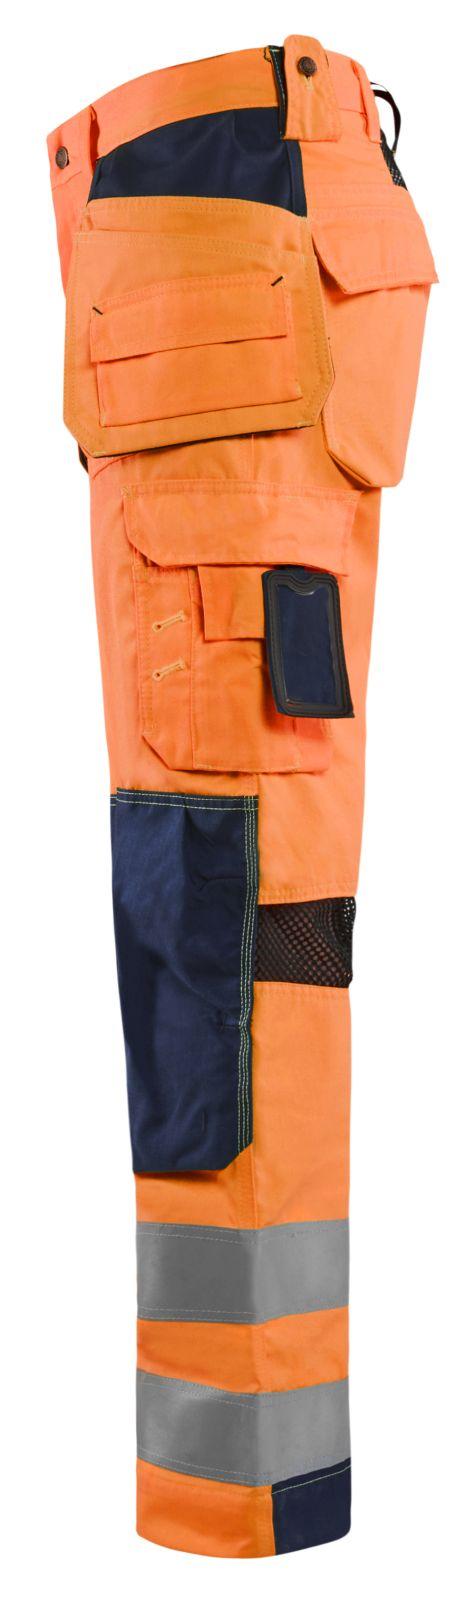 Blaklader Broeken 15651811 High Vis fluo oranje-marineblauw(5389)